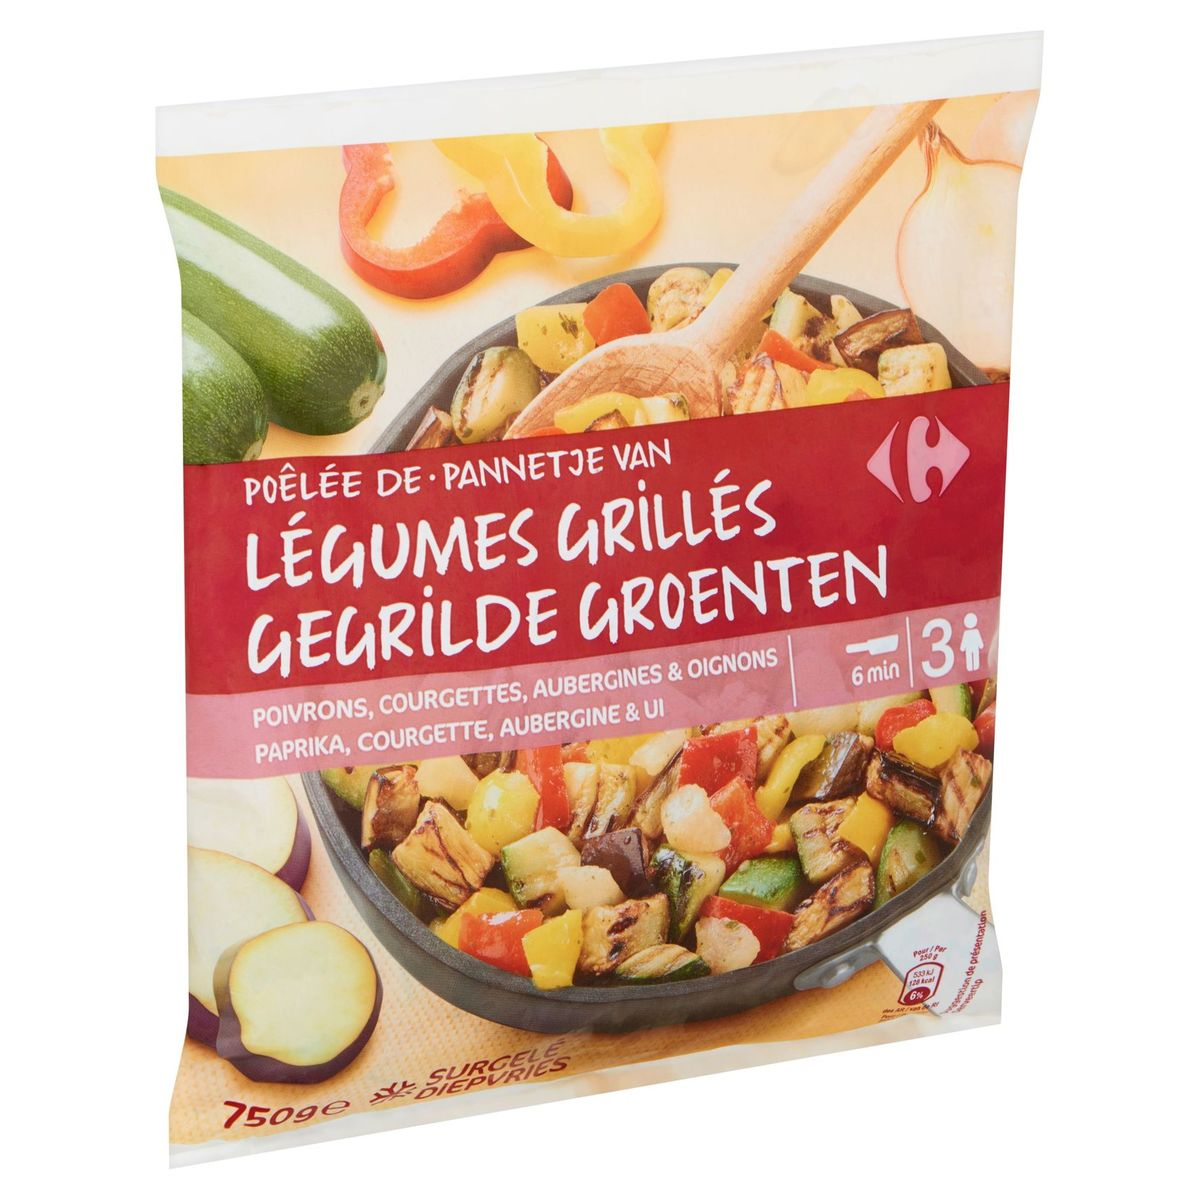 Carrefour Pannetje van Gegrilde Groenten Paprika, Courgette, Aubergine & Ui 750 g